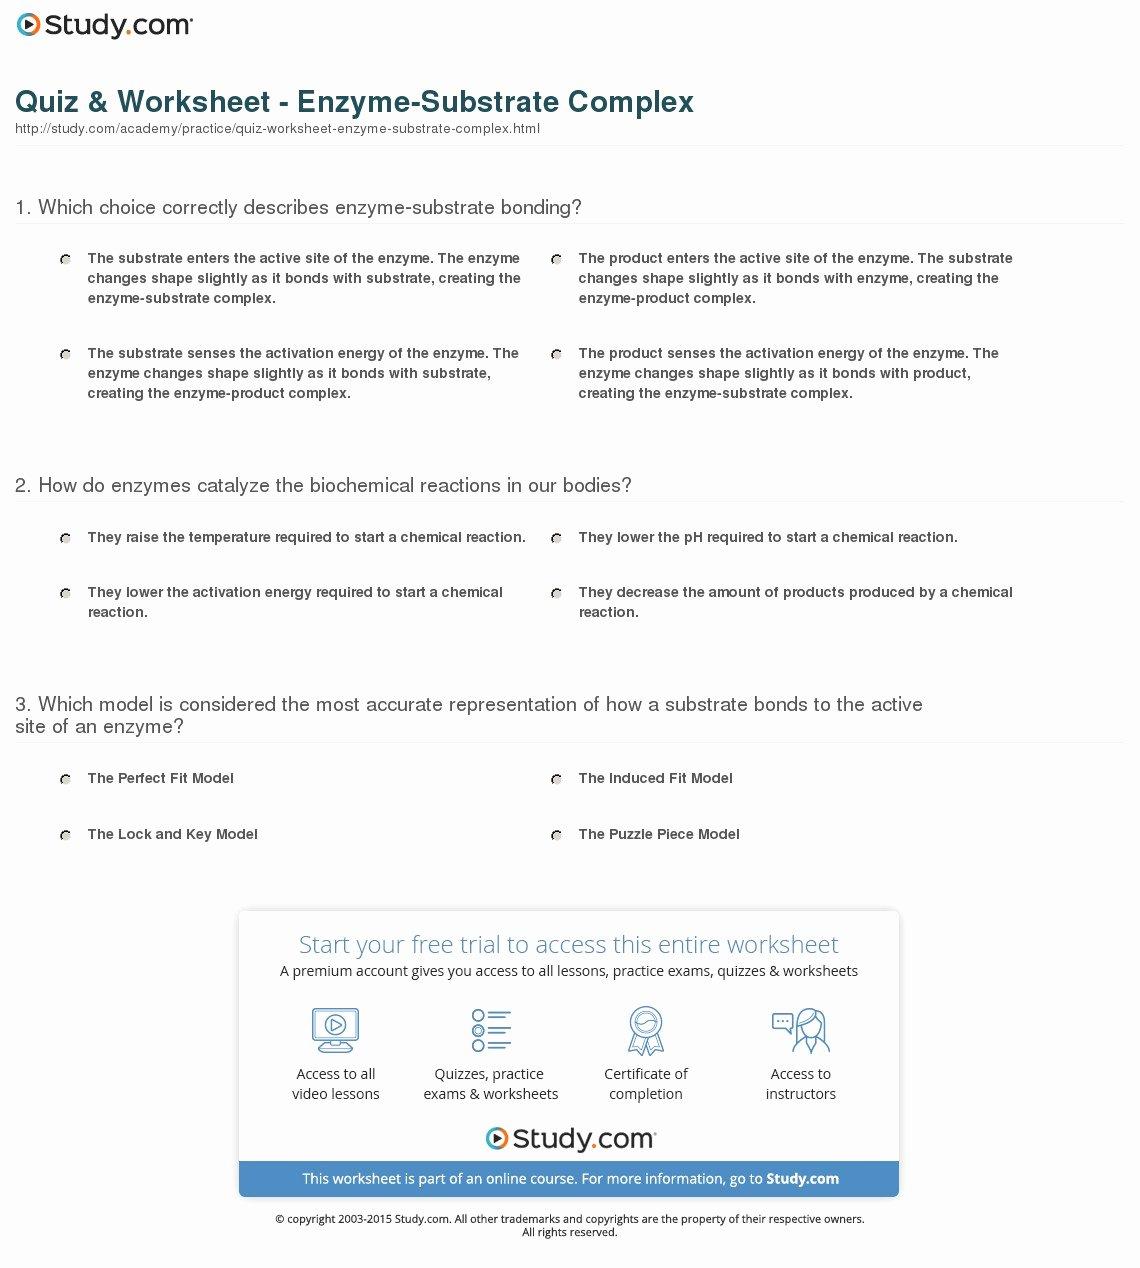 Enzymes Worksheet Answer Key Elegant Quiz & Worksheet Enzyme Substrate Plex